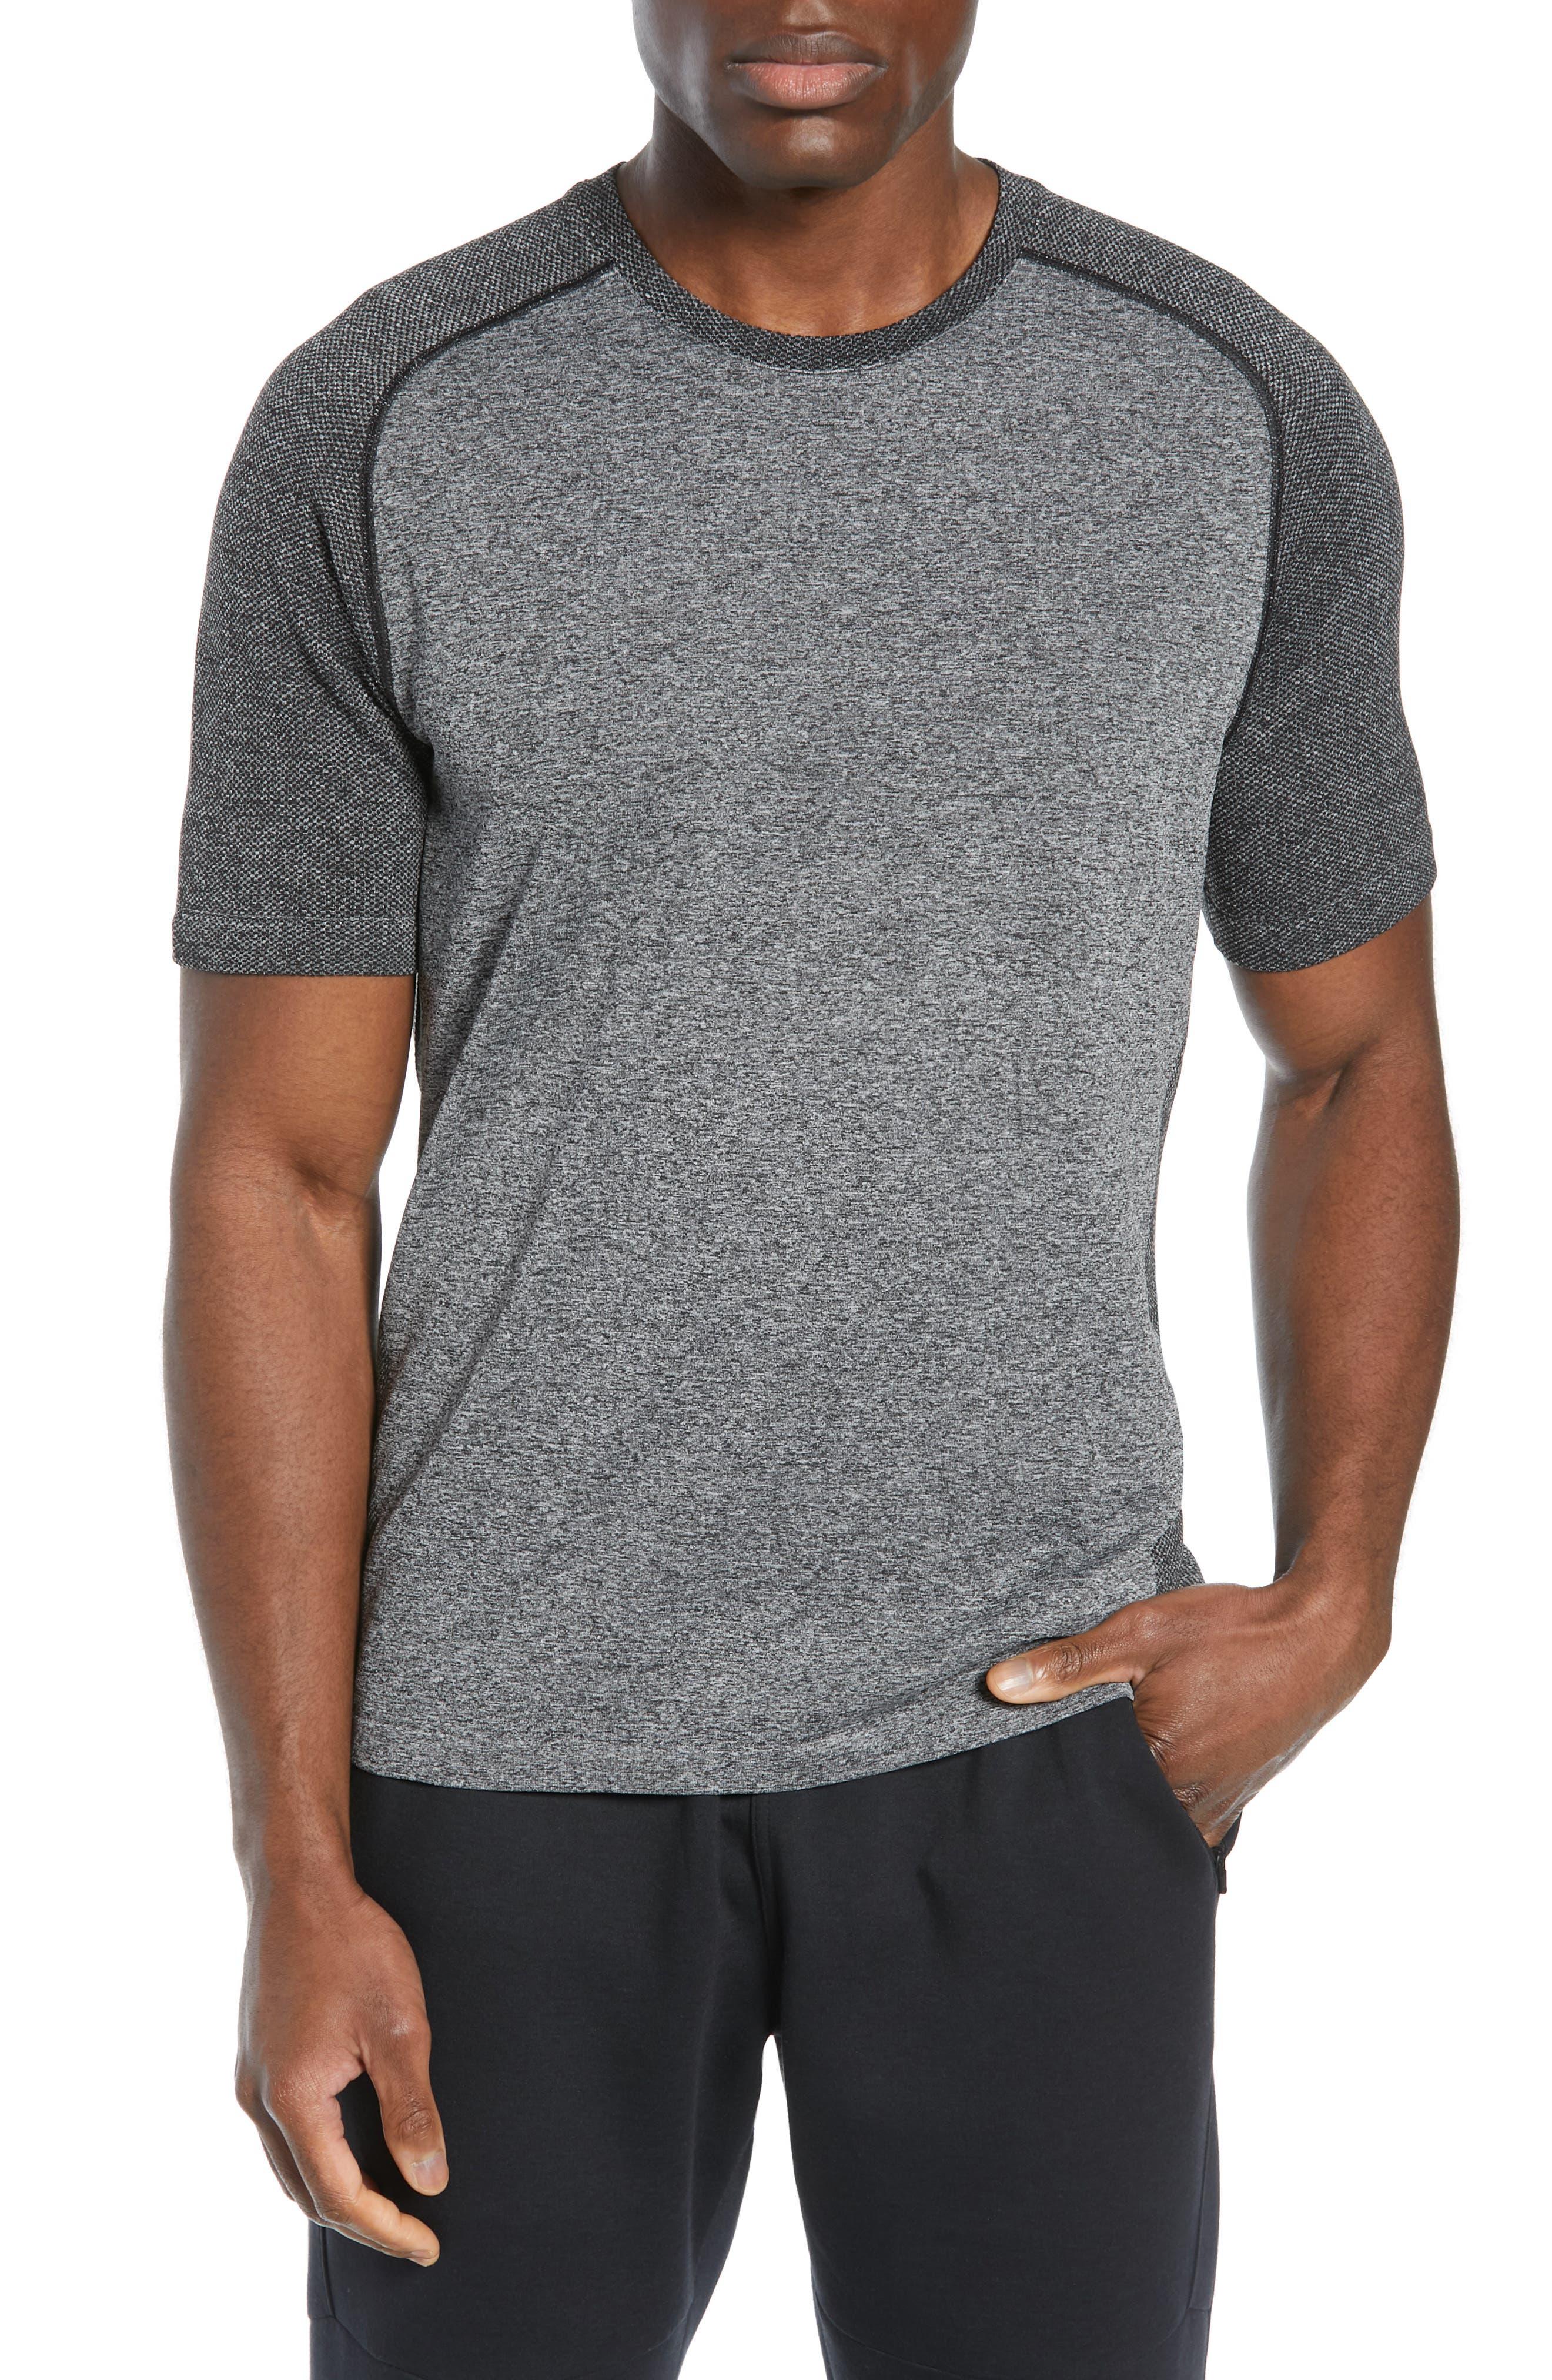 ZELLA Seamless Raglan T-Shirt, Main, color, BLACK OXIDE MELANGE